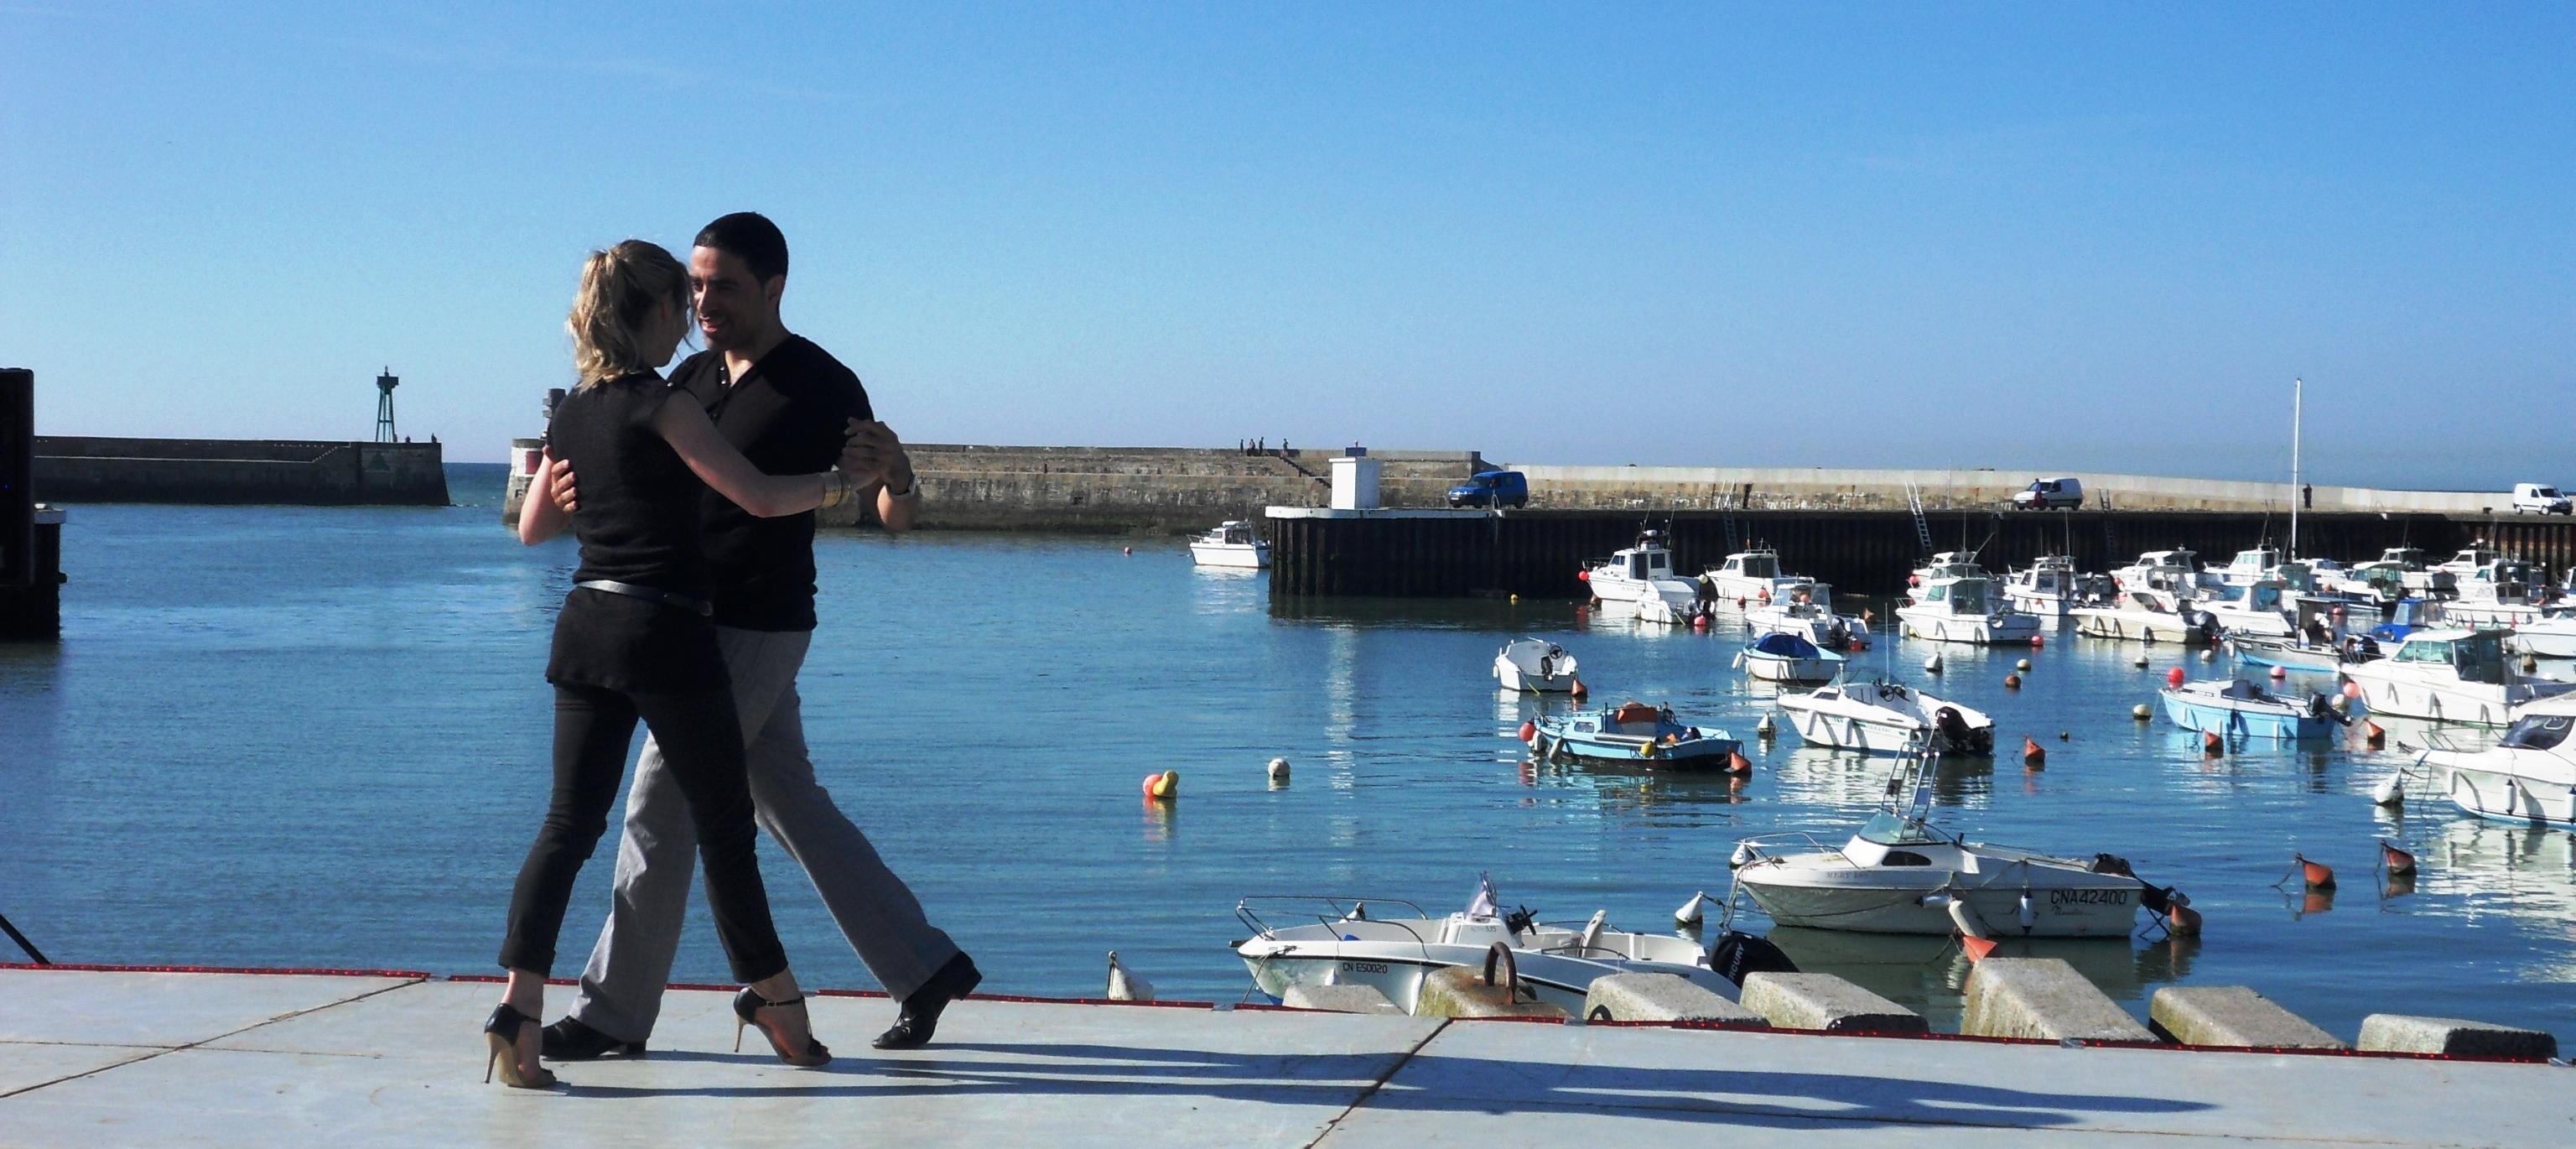 Tempotango ap ro tango port en bessin - Poissonnerie port en bessin ...